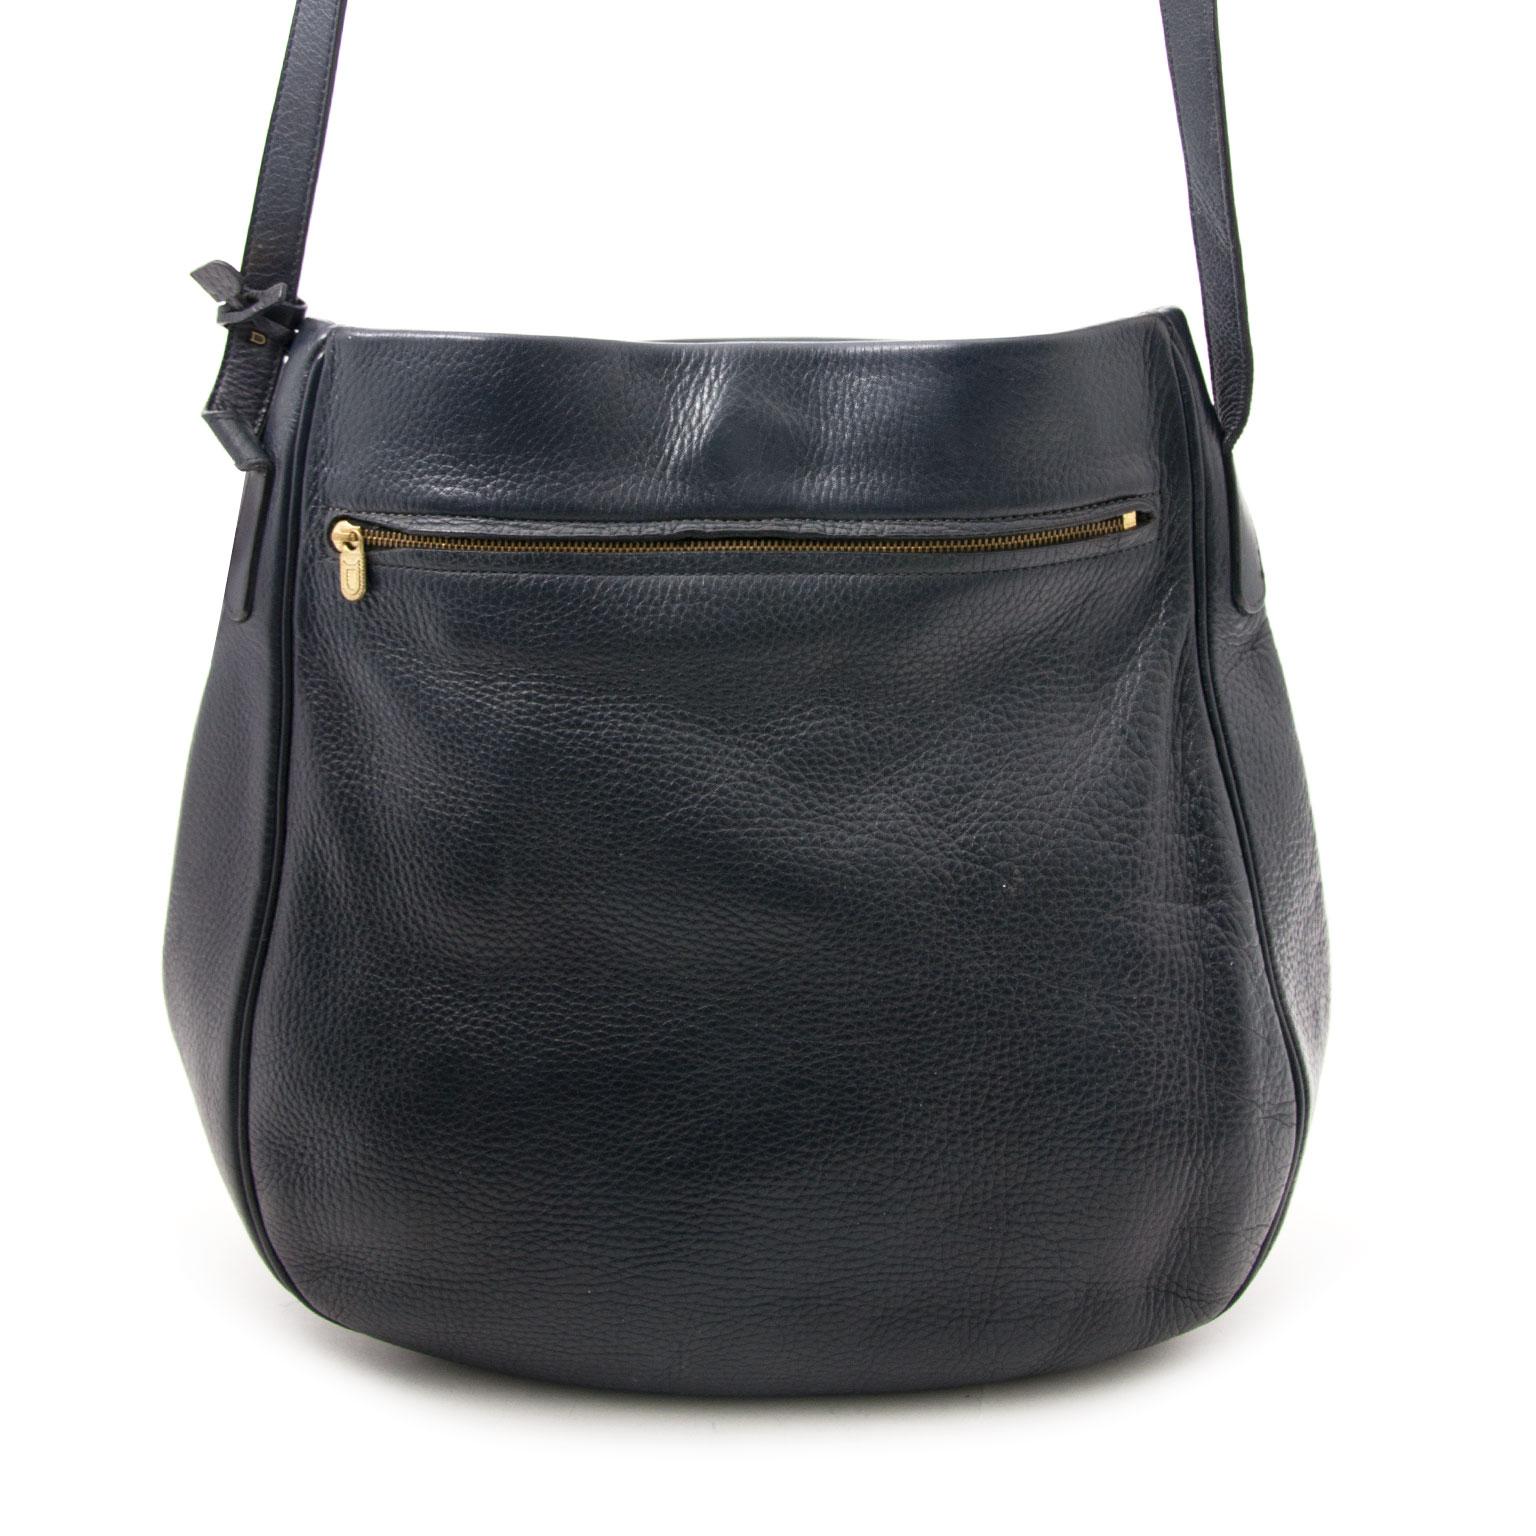 Delvaux Blue Bannière Hobo Shoulder Bag buy and sell your designer items.